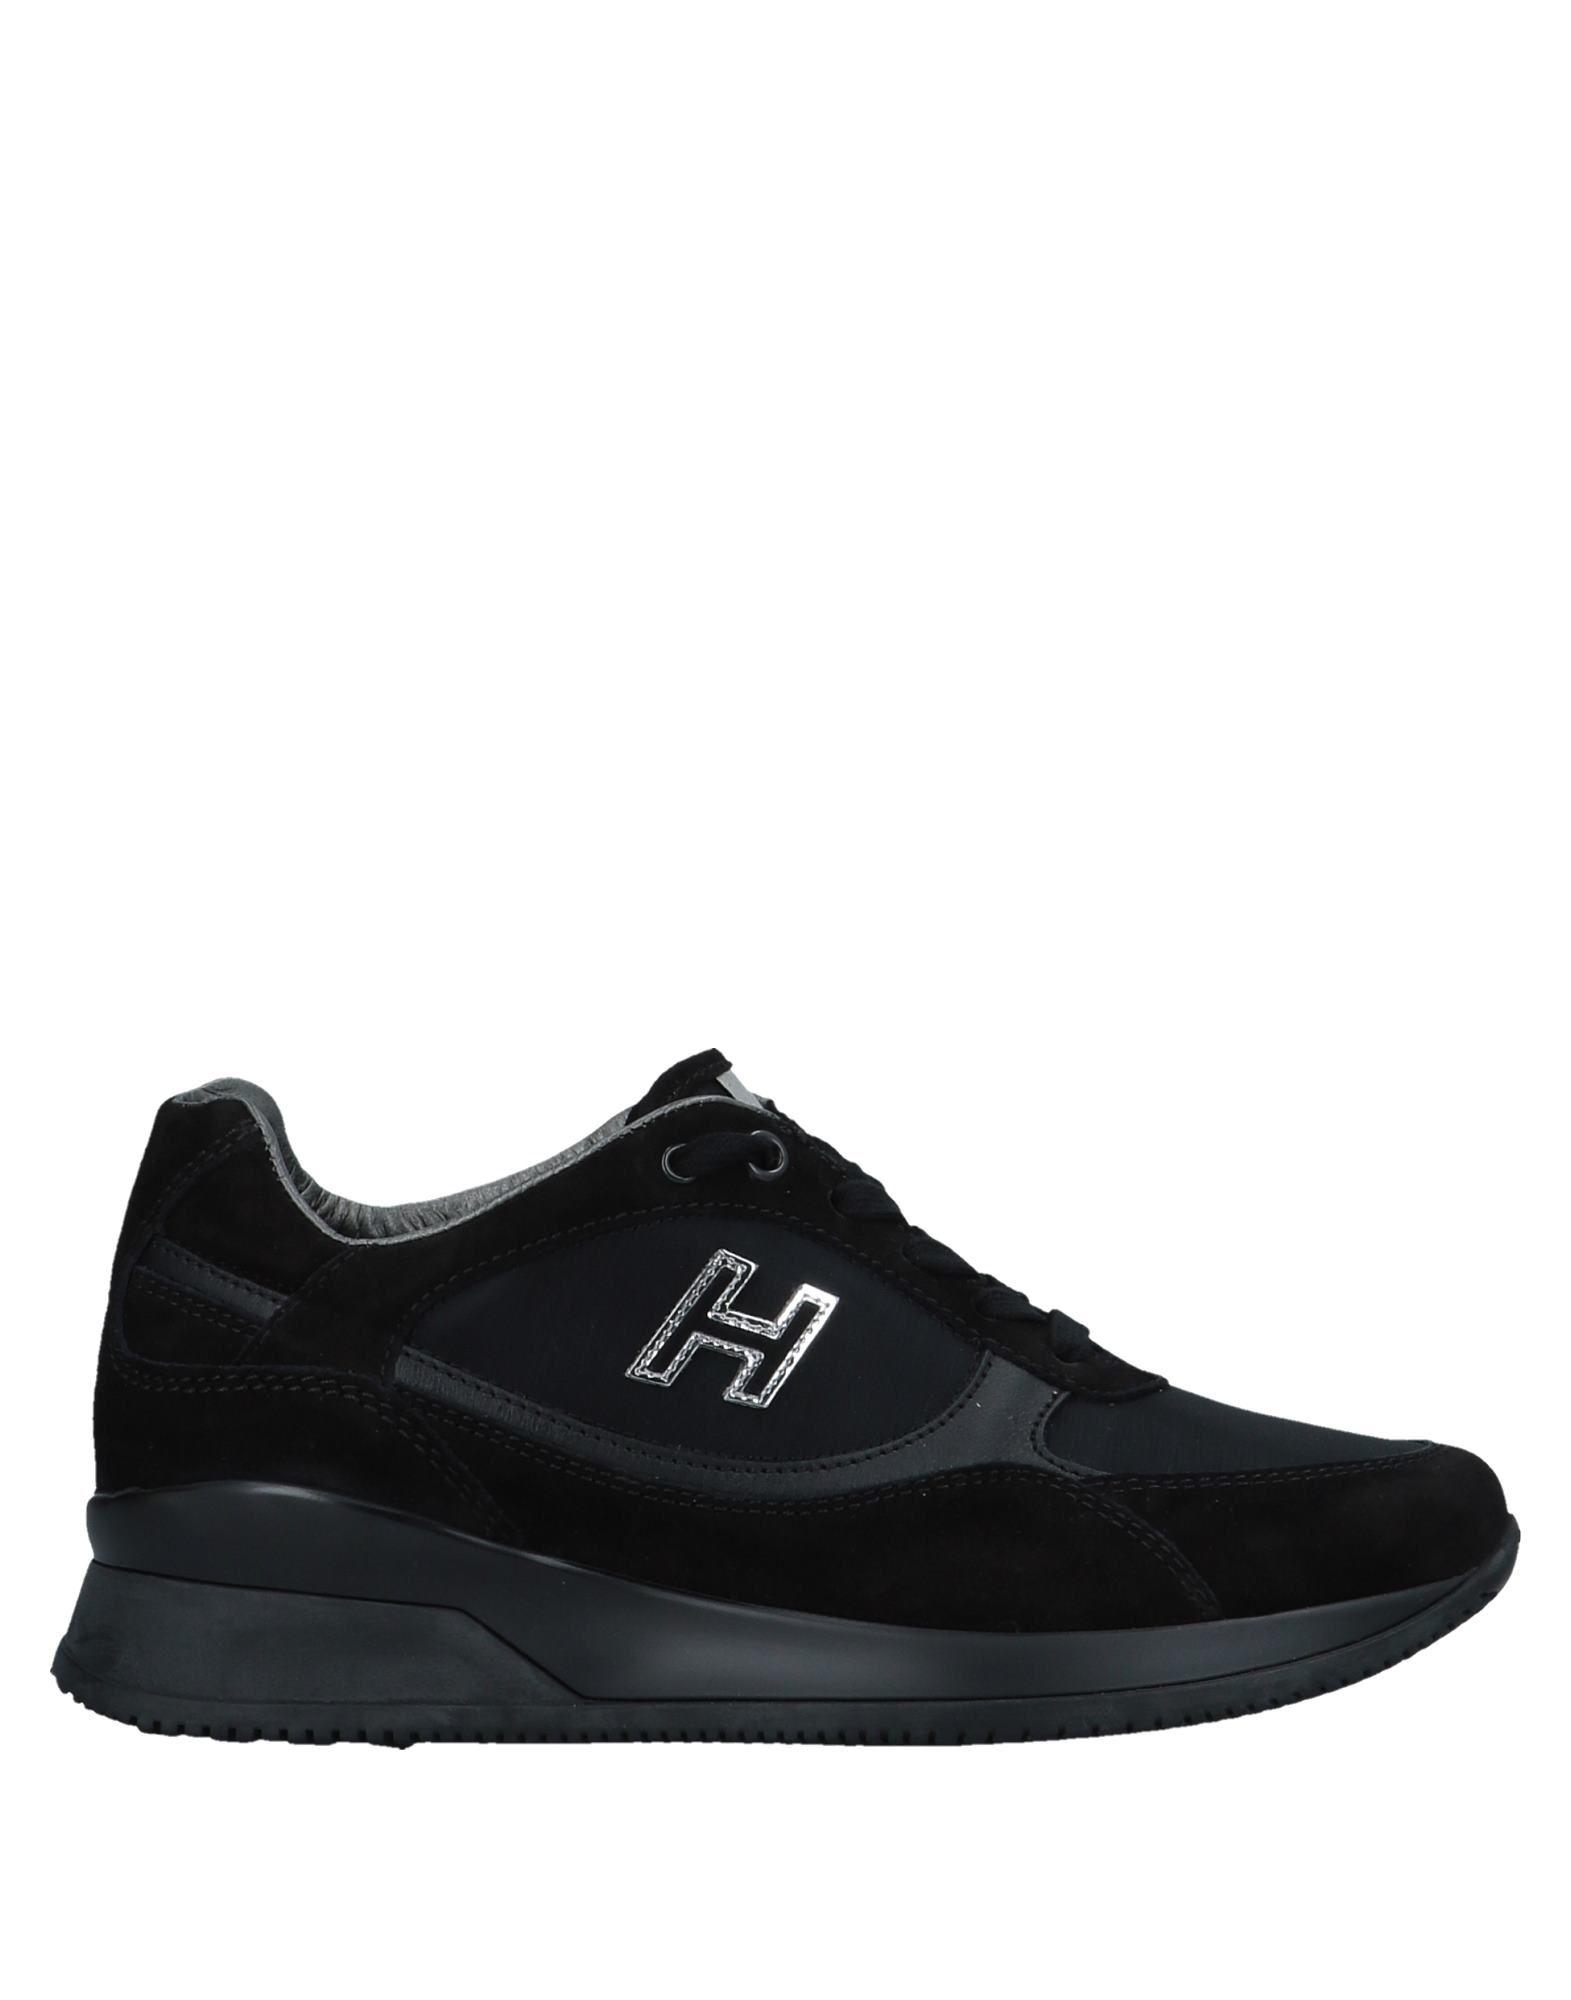 Moda Sneakers Hogan Donna - 11540056WK